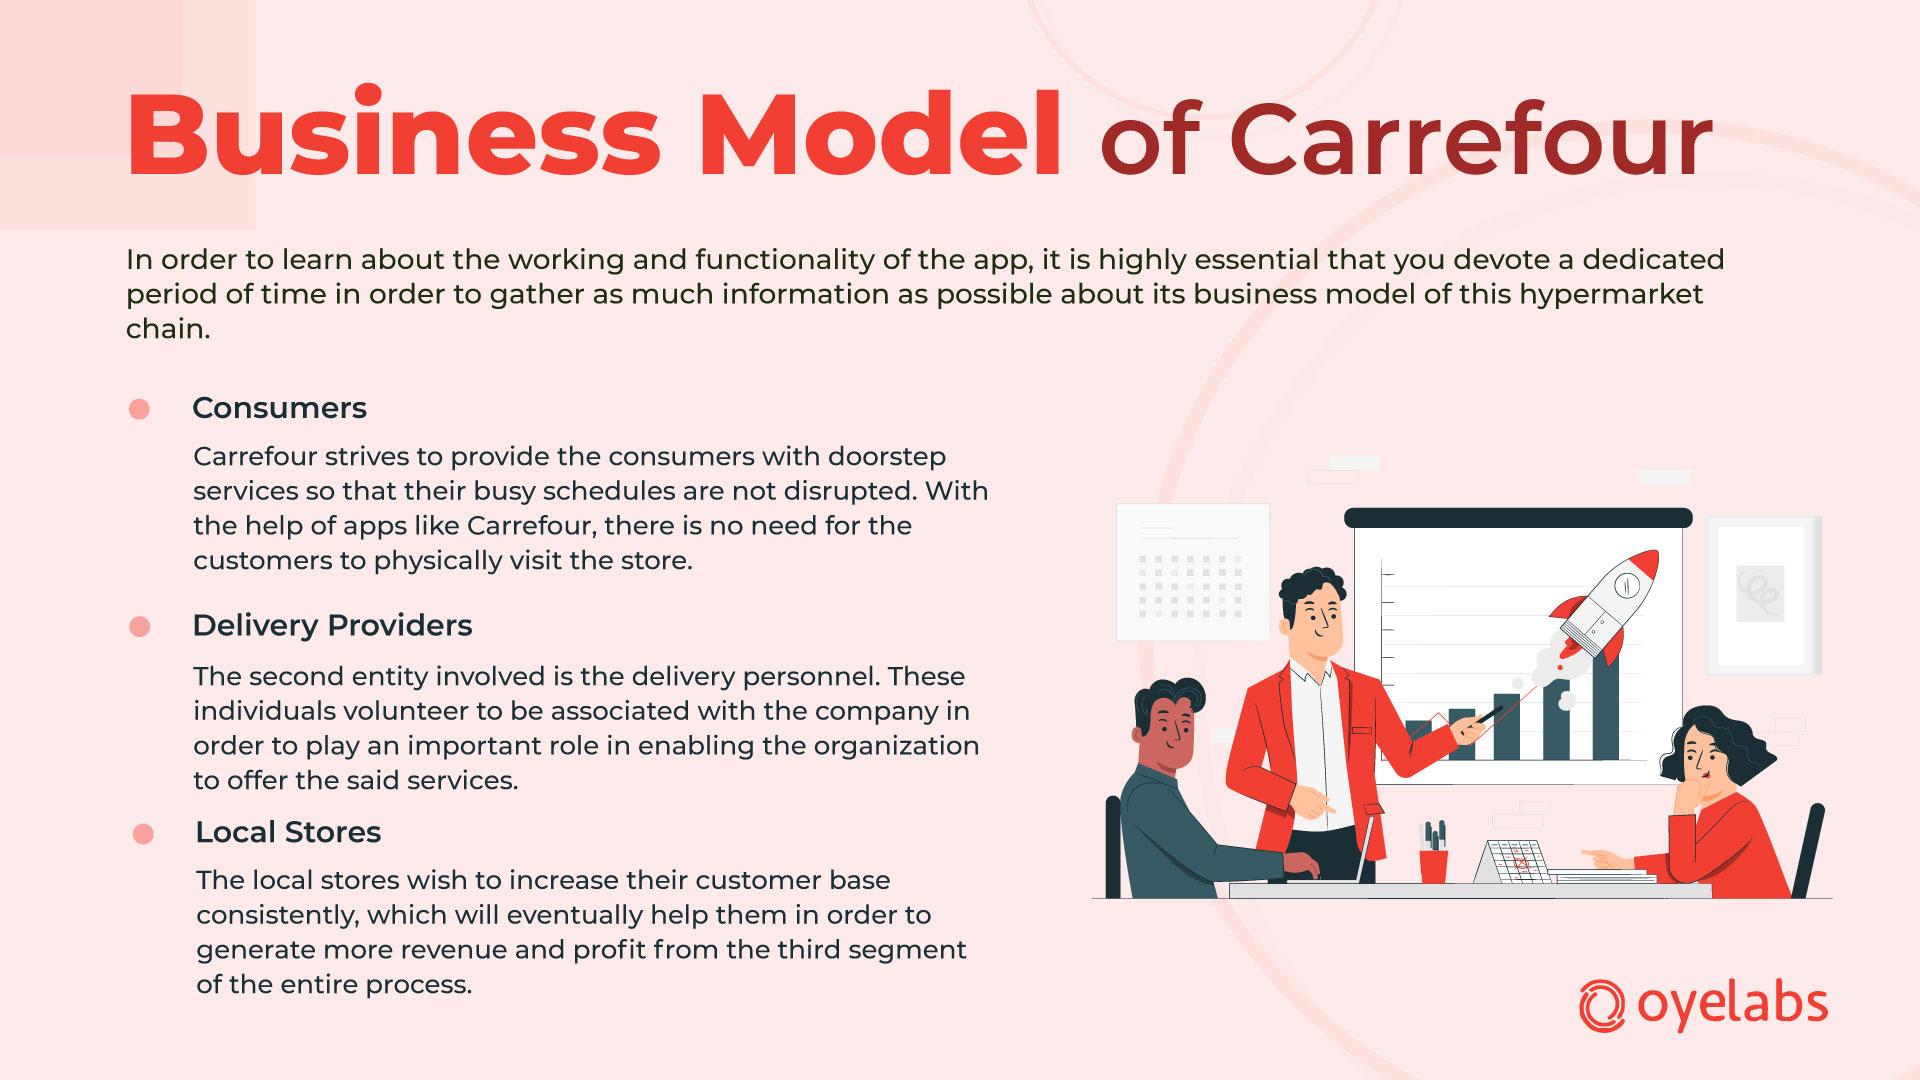 Business-Model-Carrefour-app